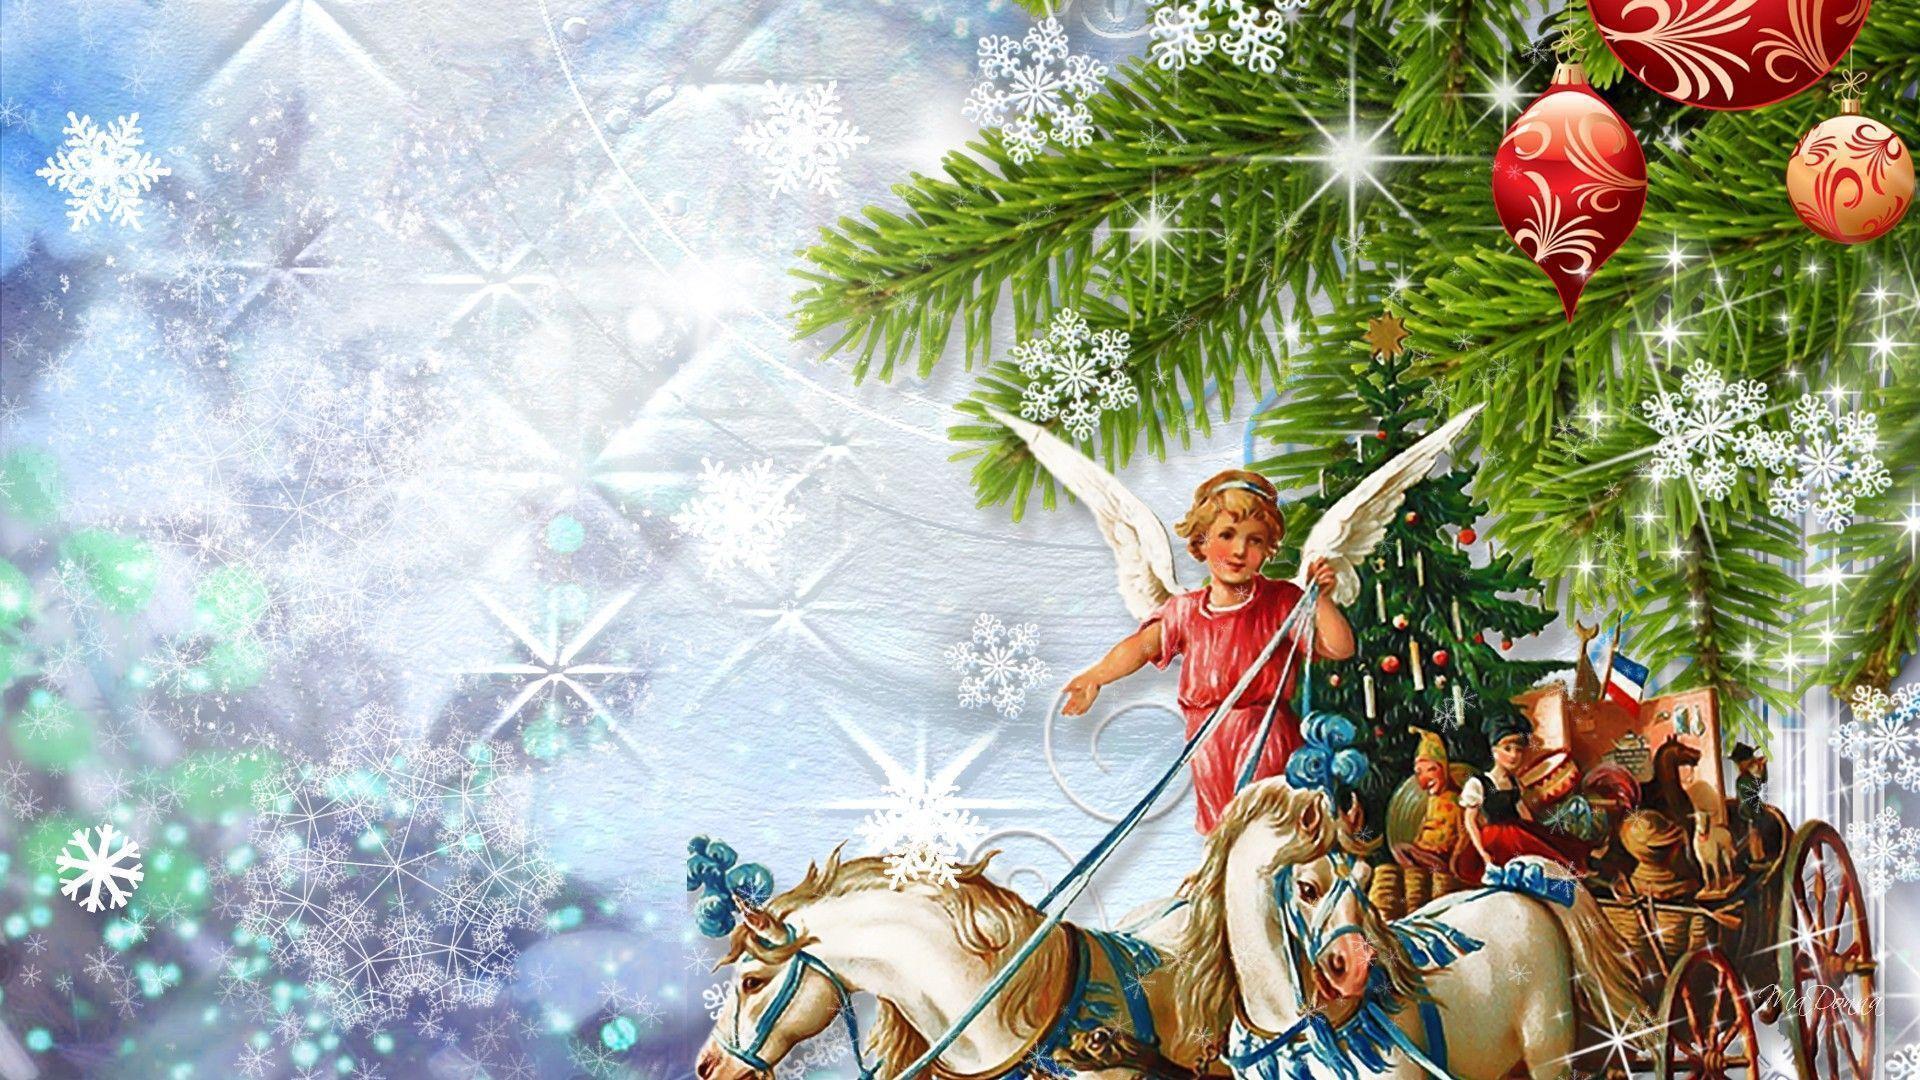 Christmas Angels.Christmas Angels Wallpapers Top Free Christmas Angels